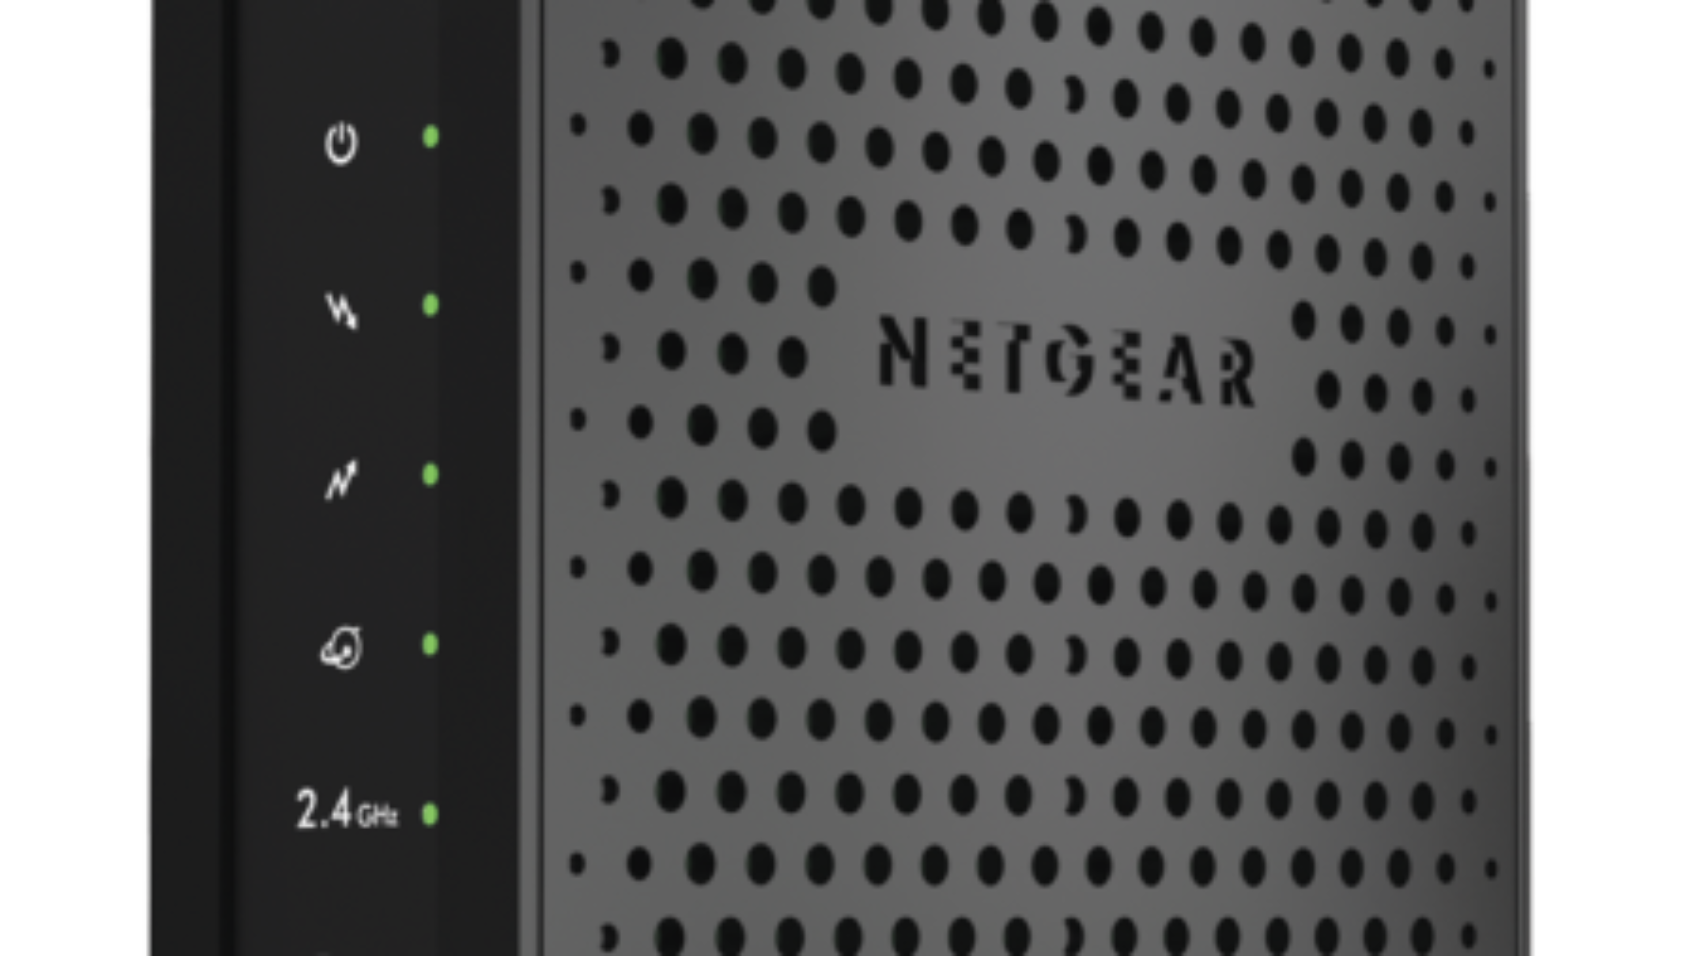 Netgear Wi-Fi extender setup